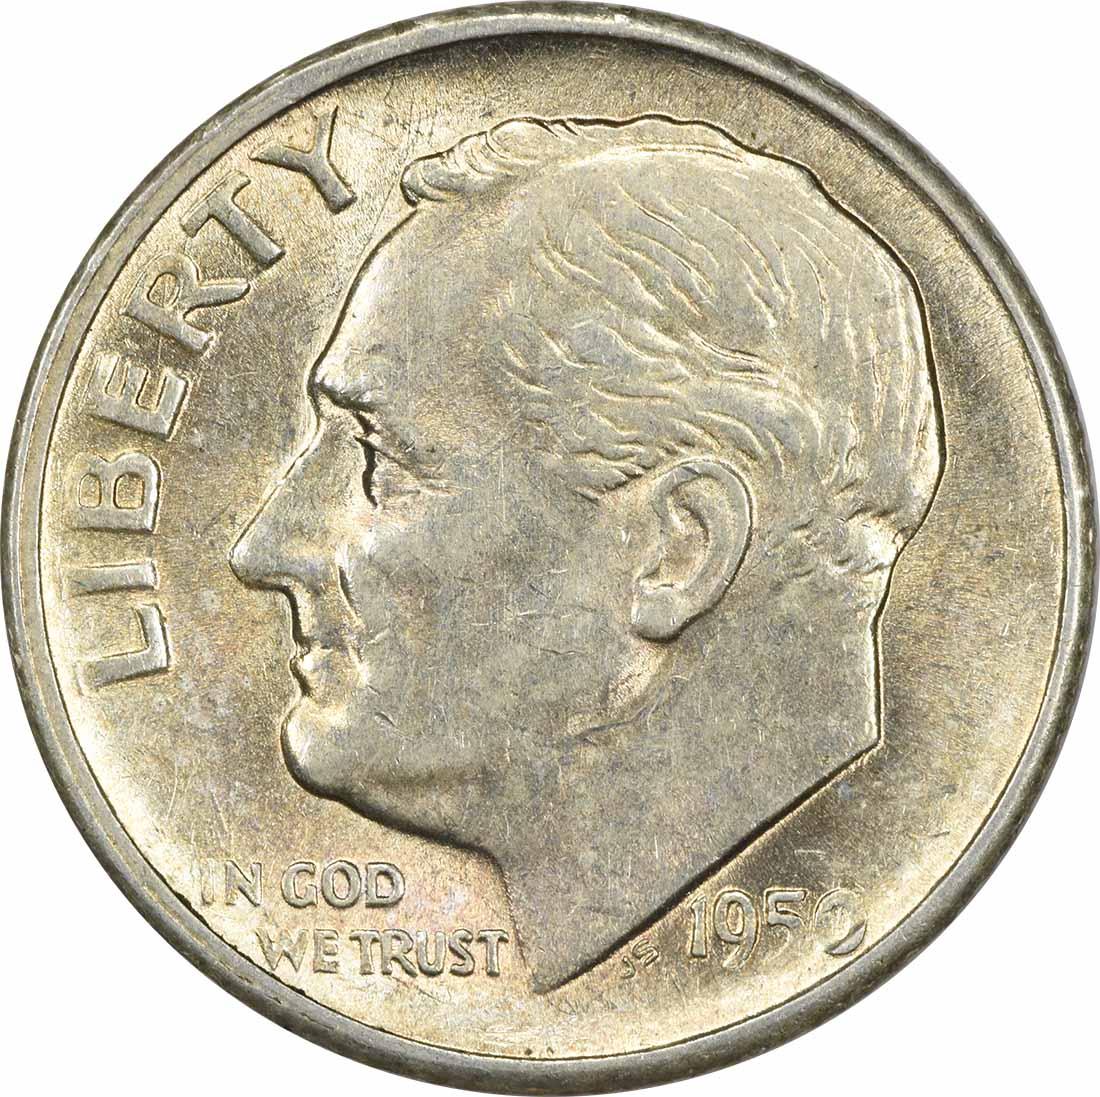 1950-S Roosevelt Silver Dime AU58 Uncertified